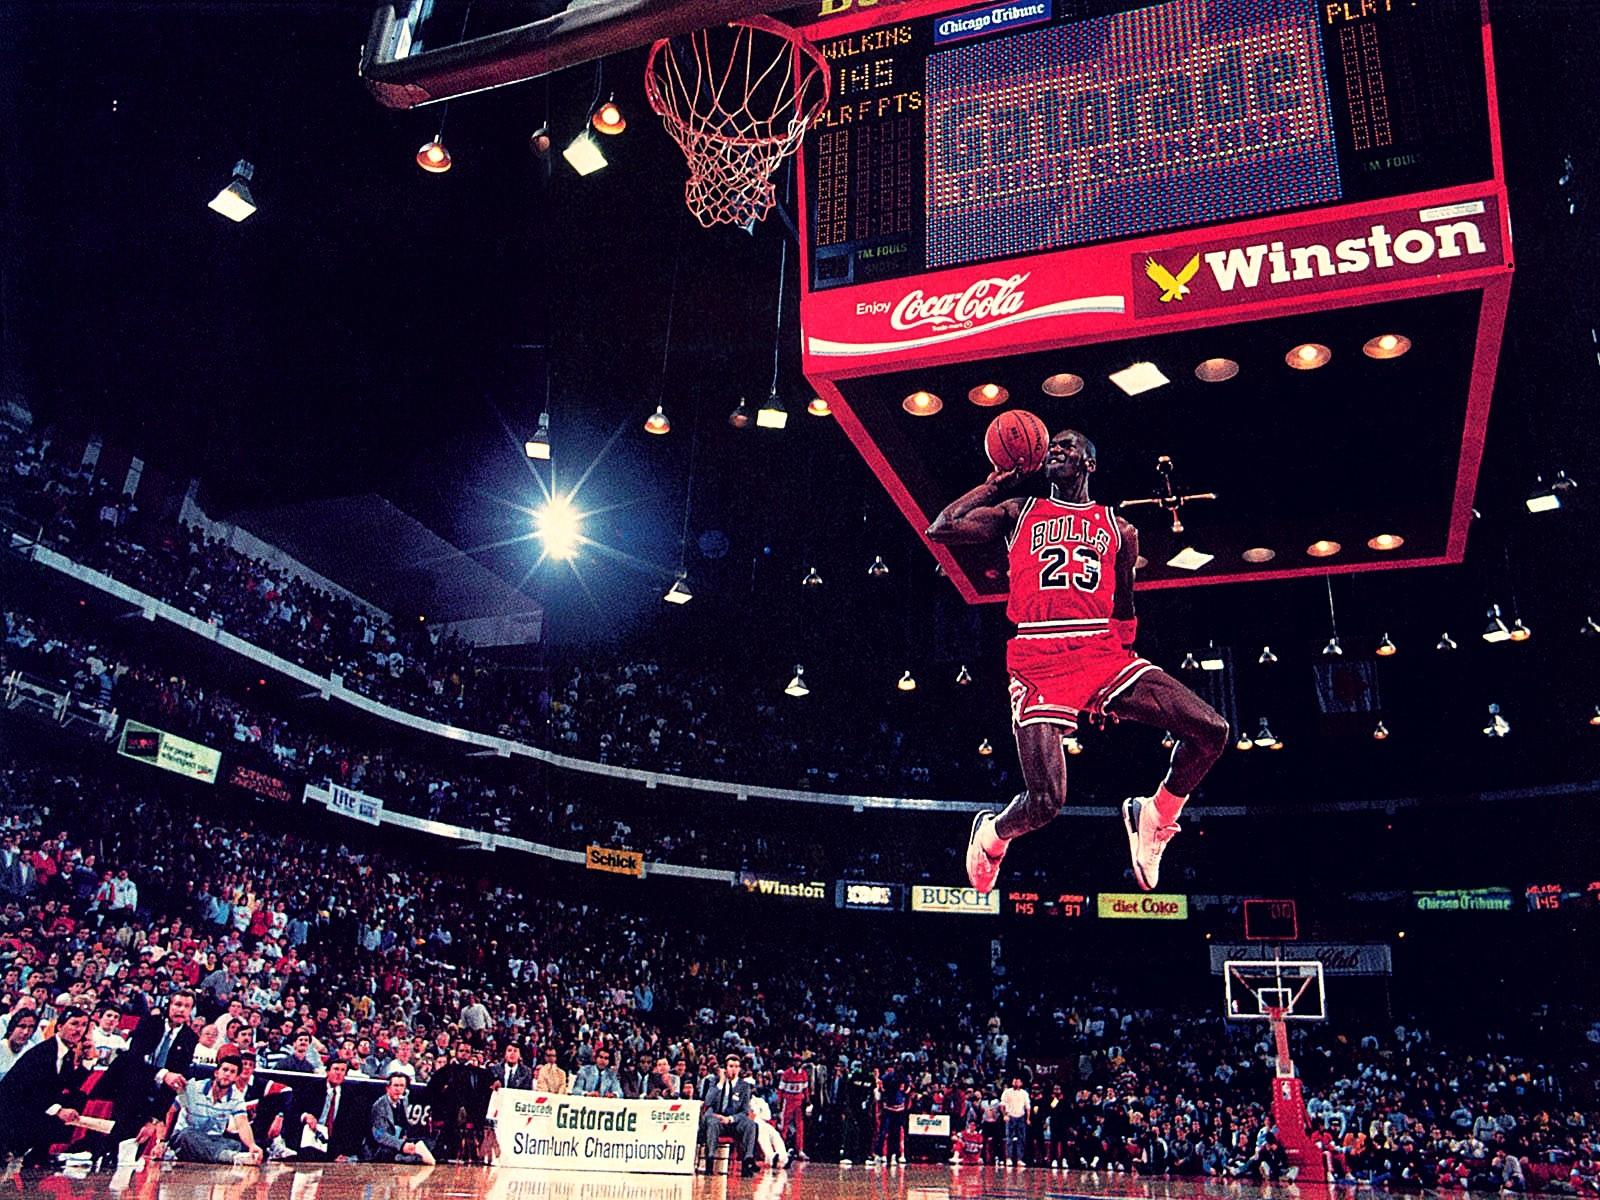 Wallpaper Sports Jumping Stadium NBA Structure Arena Slam